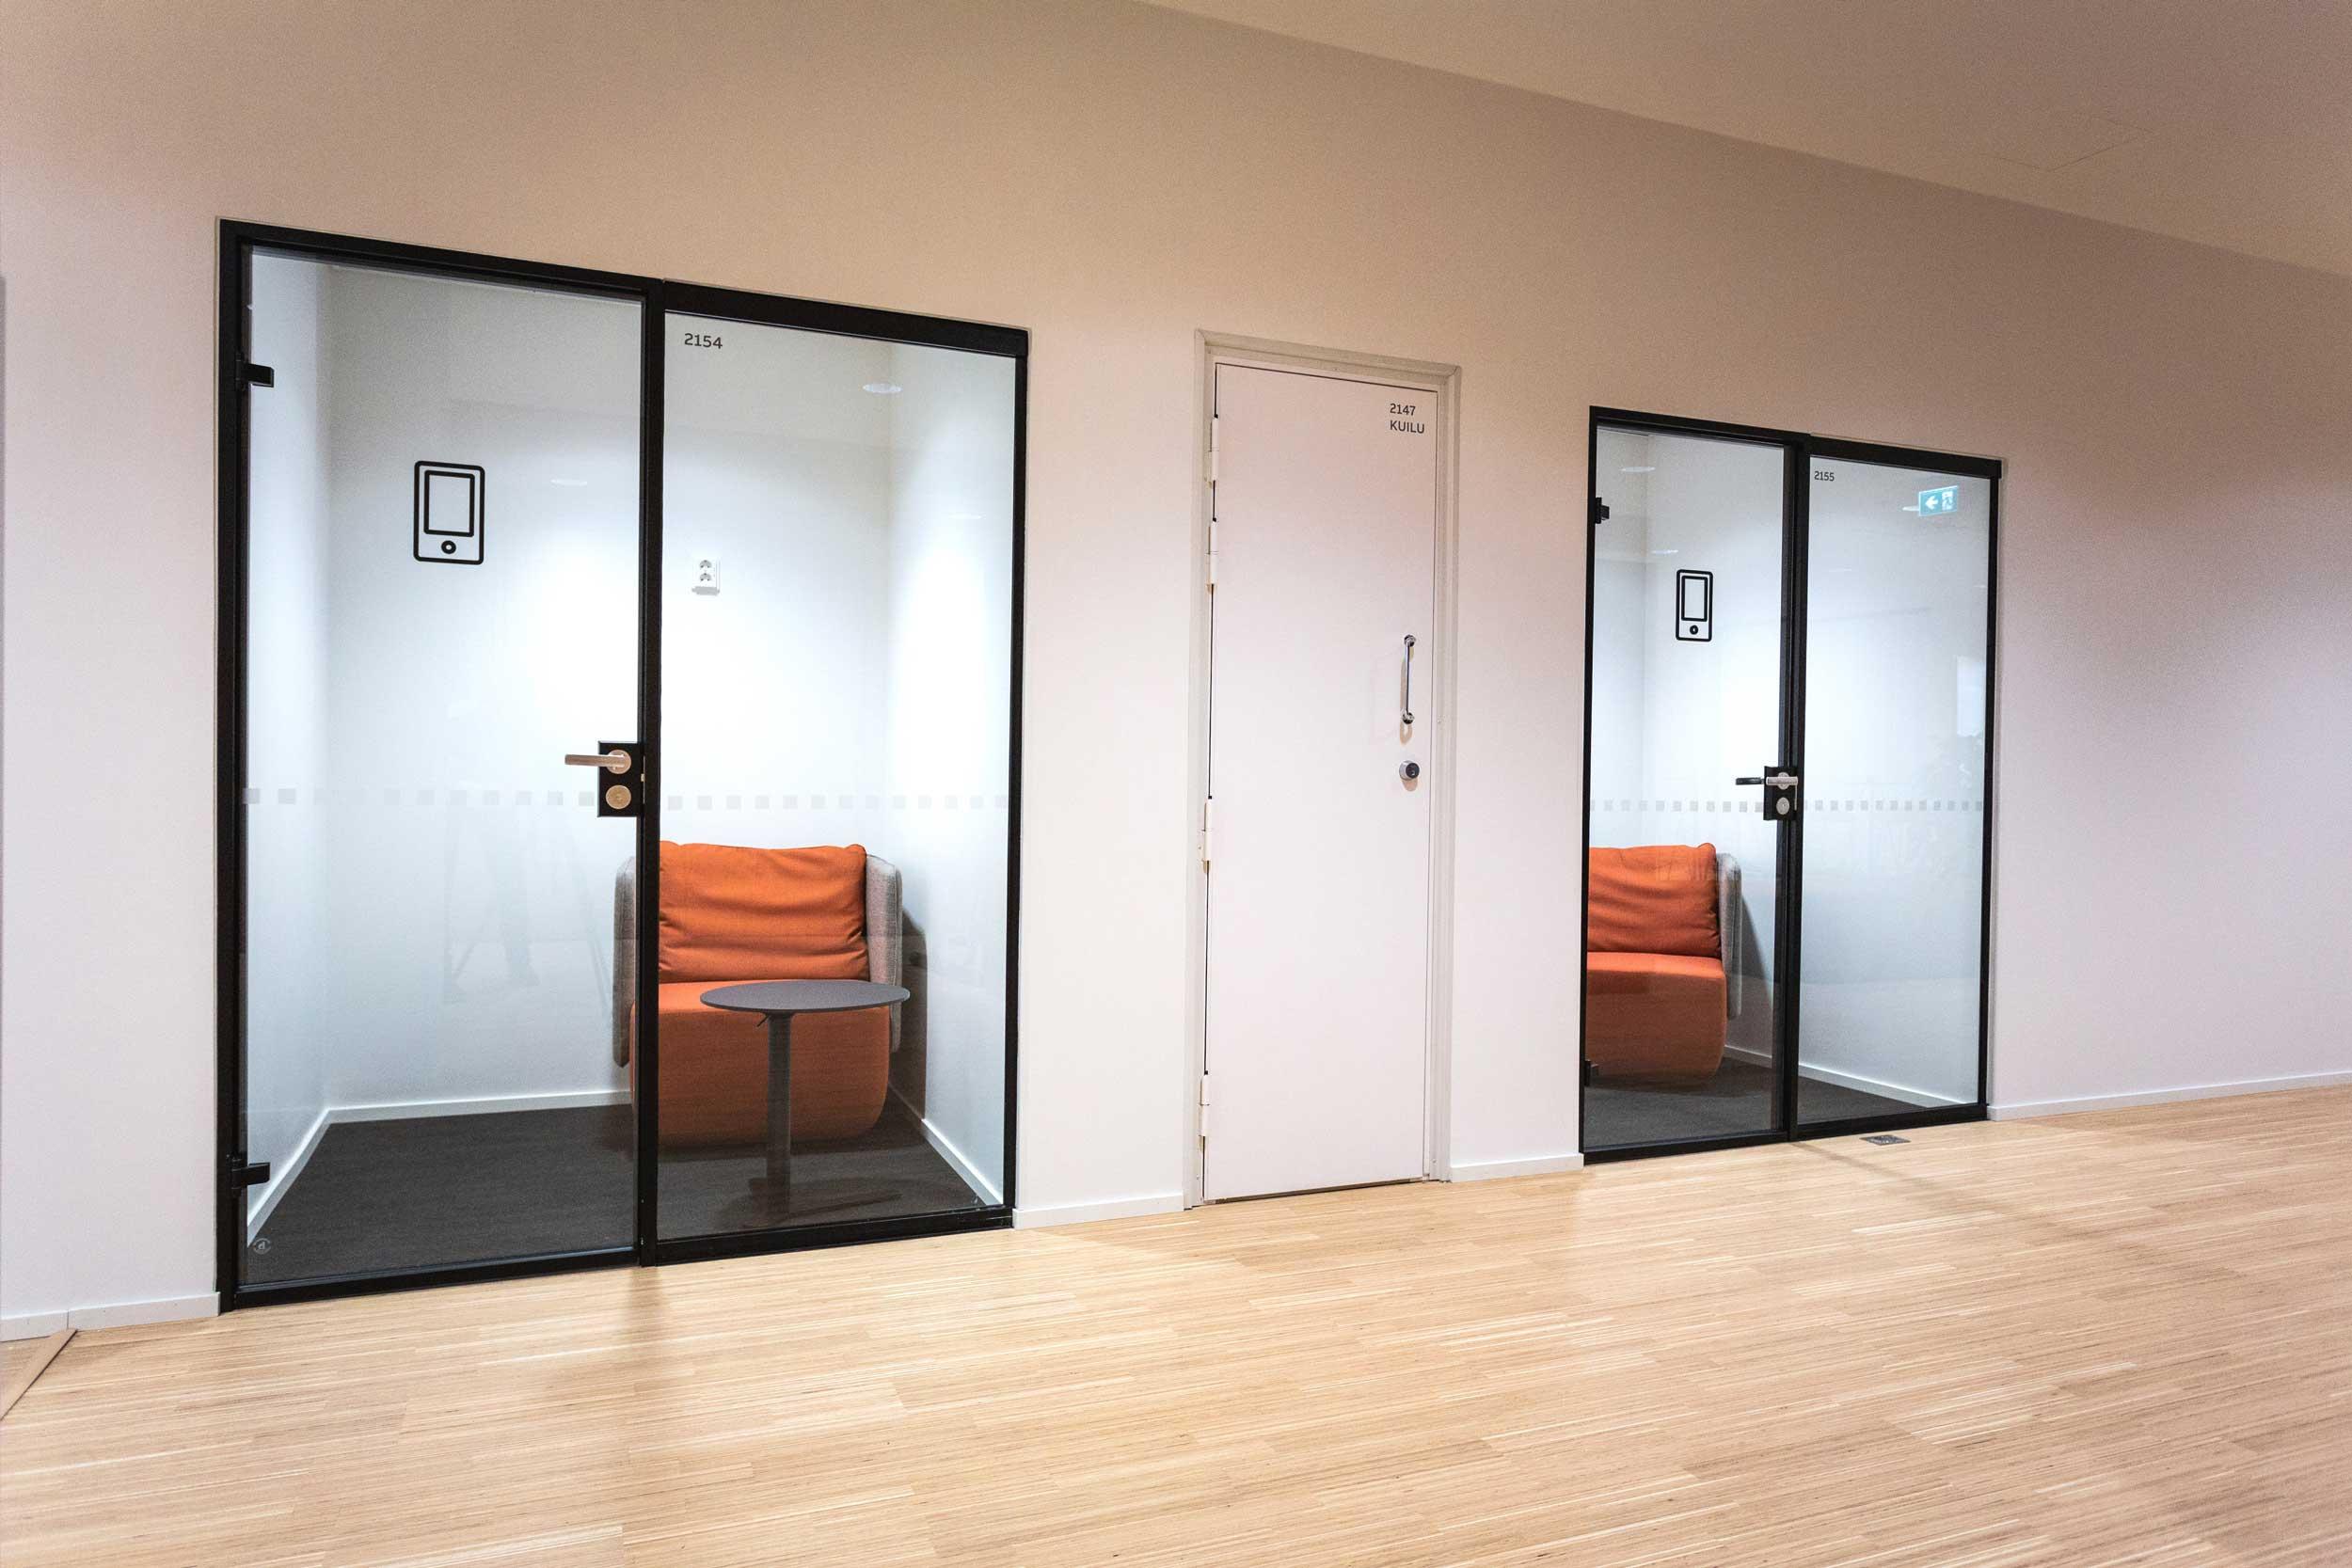 Scanmikael Office glass walls_Soundproof glass walls_ABB Vaasa, Finland